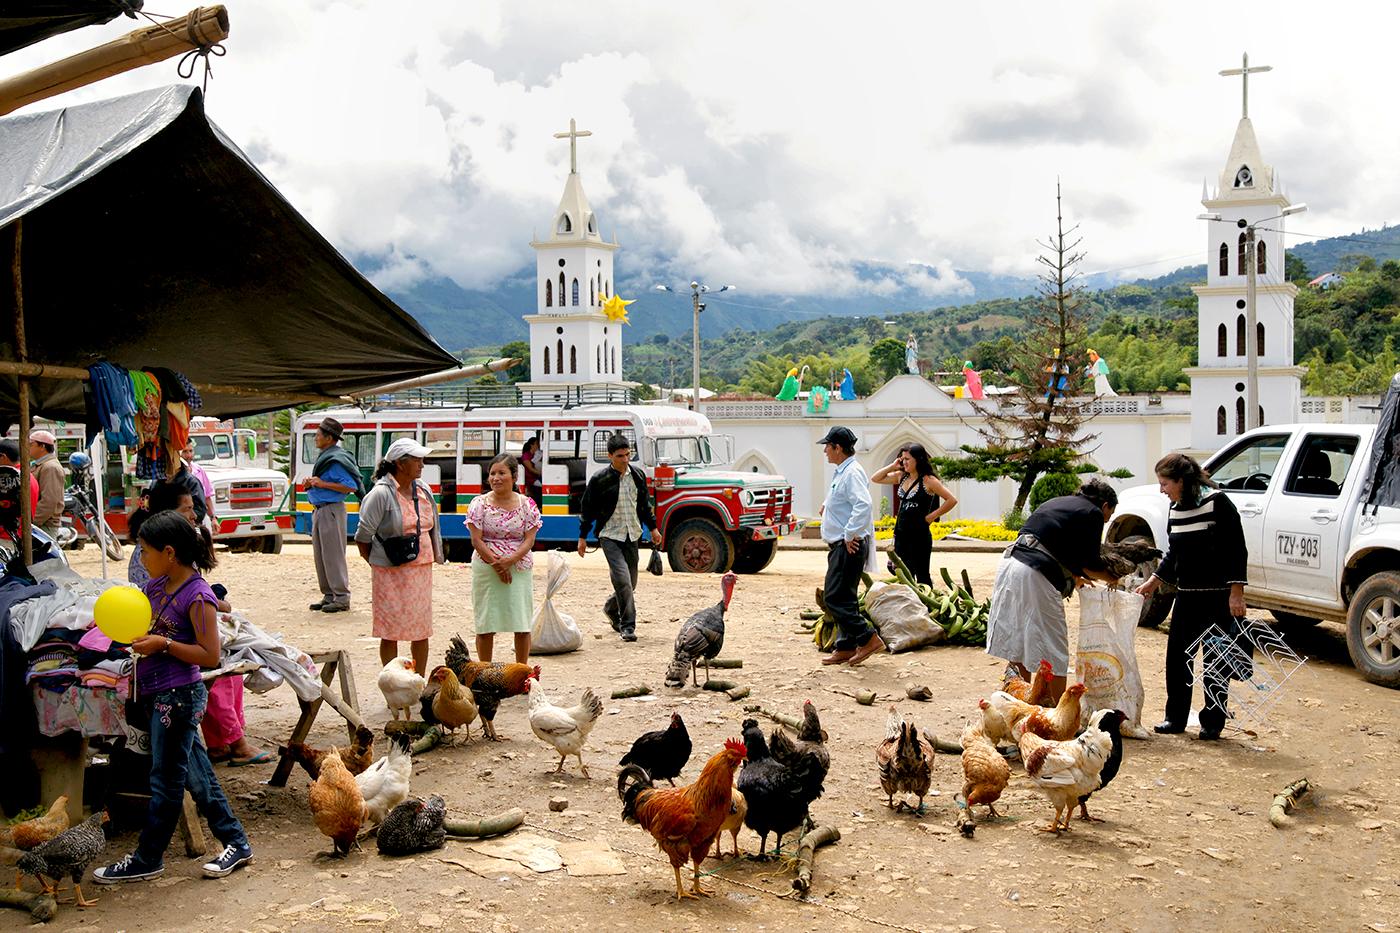 San Augustin Town square